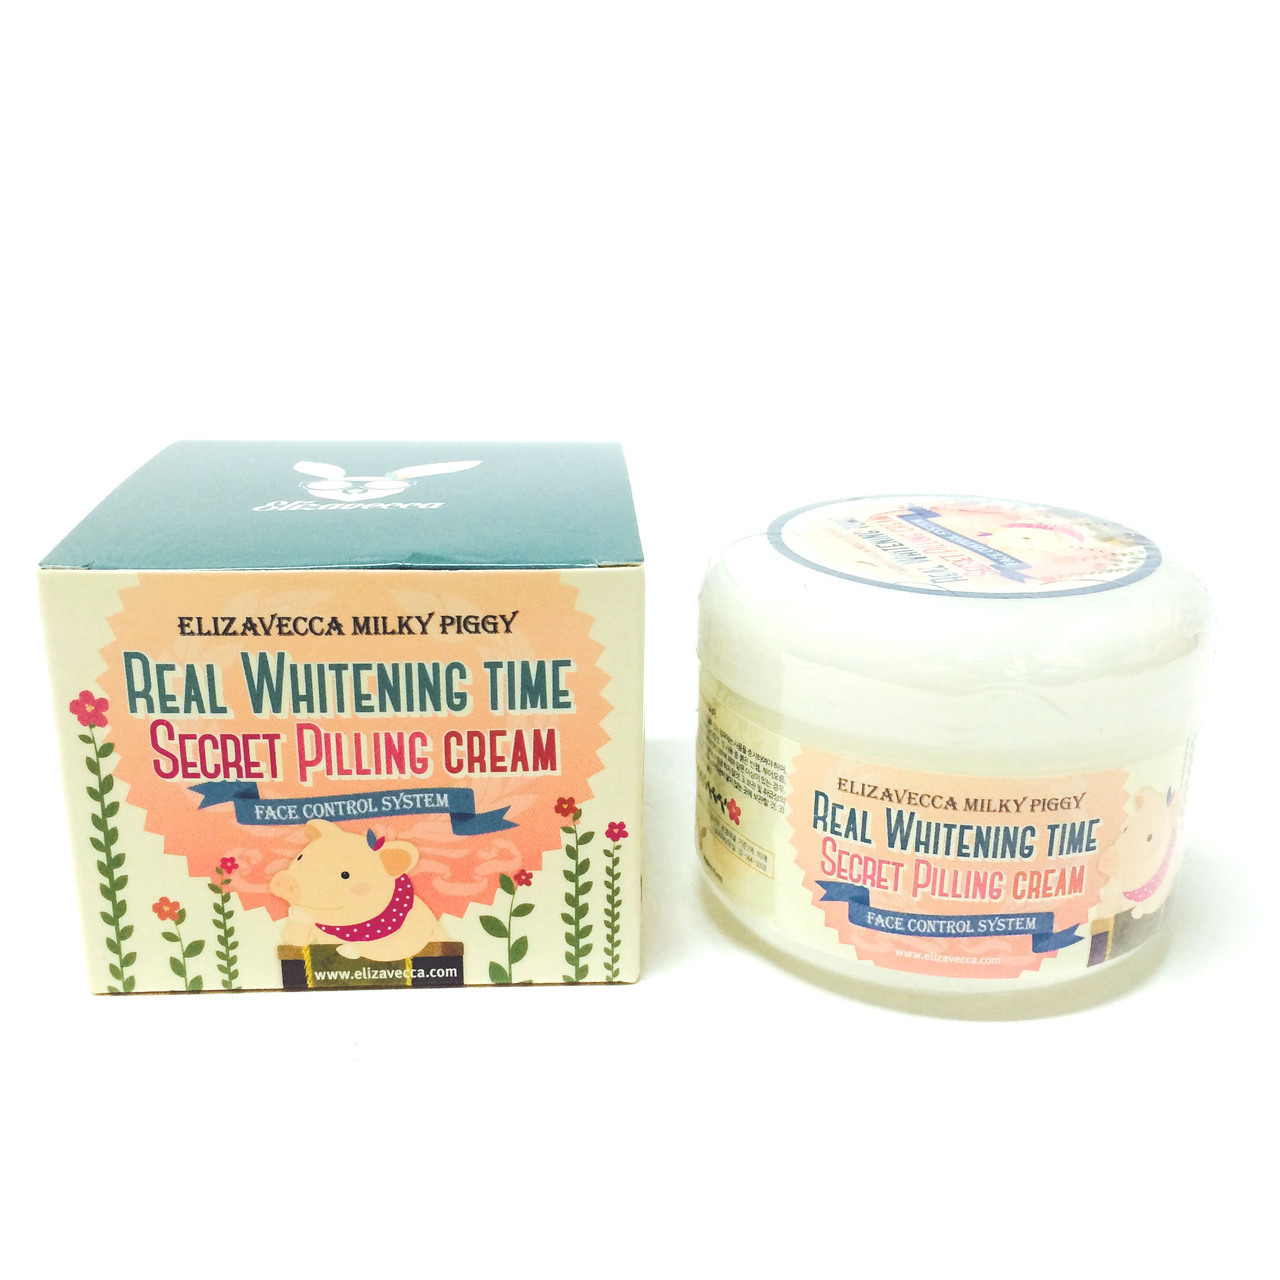 Elizavecca Крем для лица ЭФФЕКТ ПИЛИНГА осветляющий Real Whitening Time Secret Pilling Cream, 100 гр